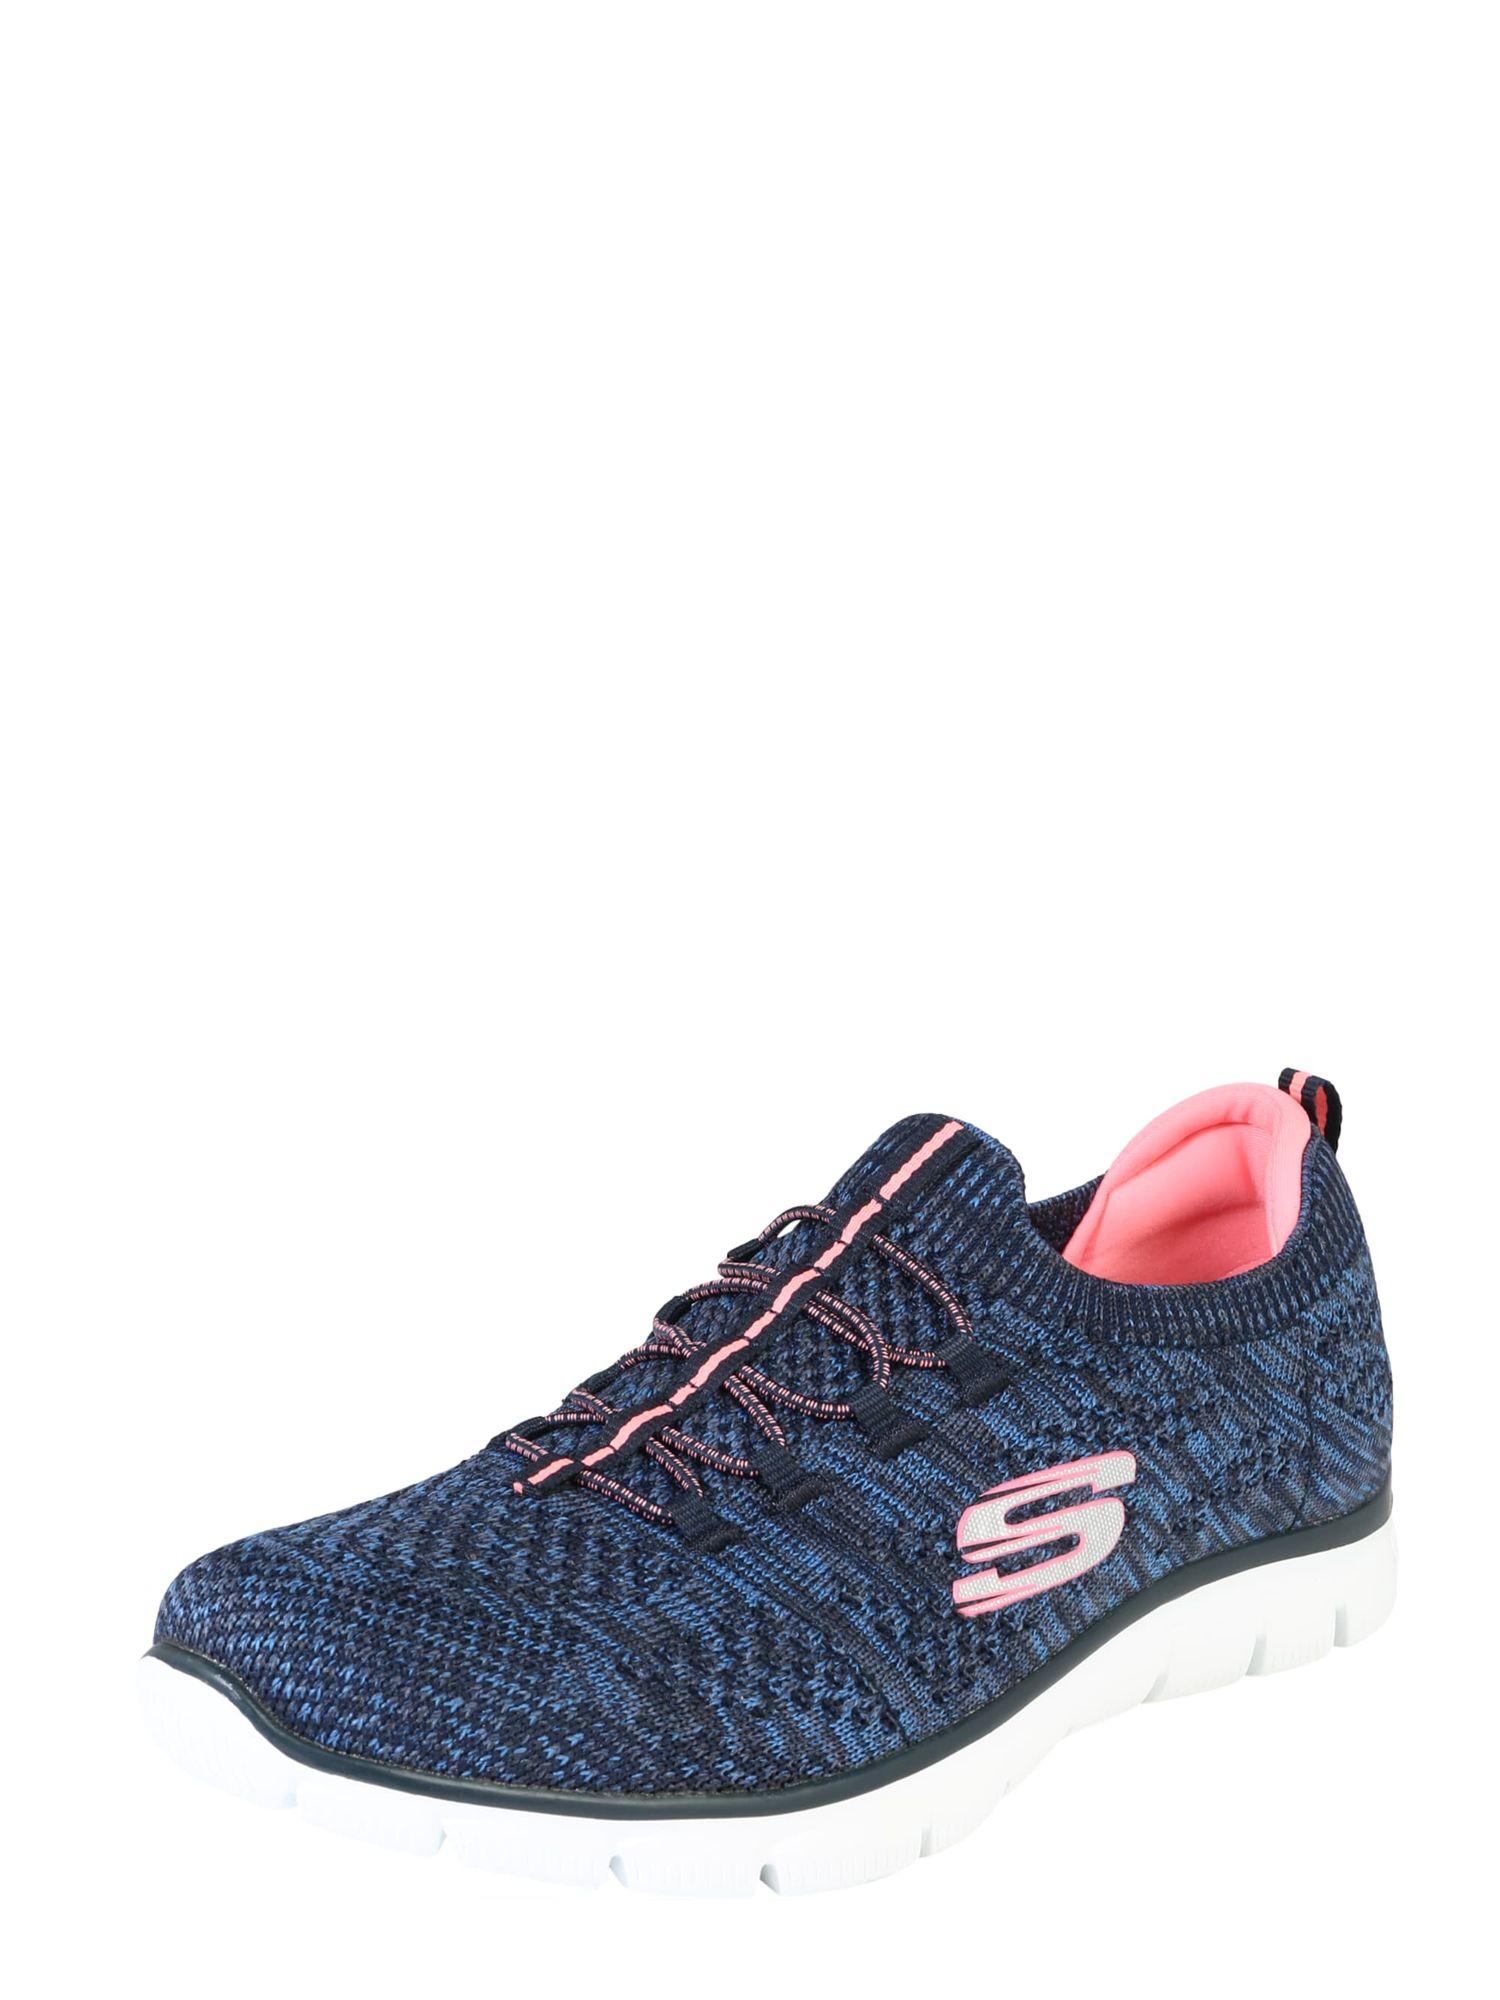 Sneaker ´EMPIRE - SHARP THINKING´